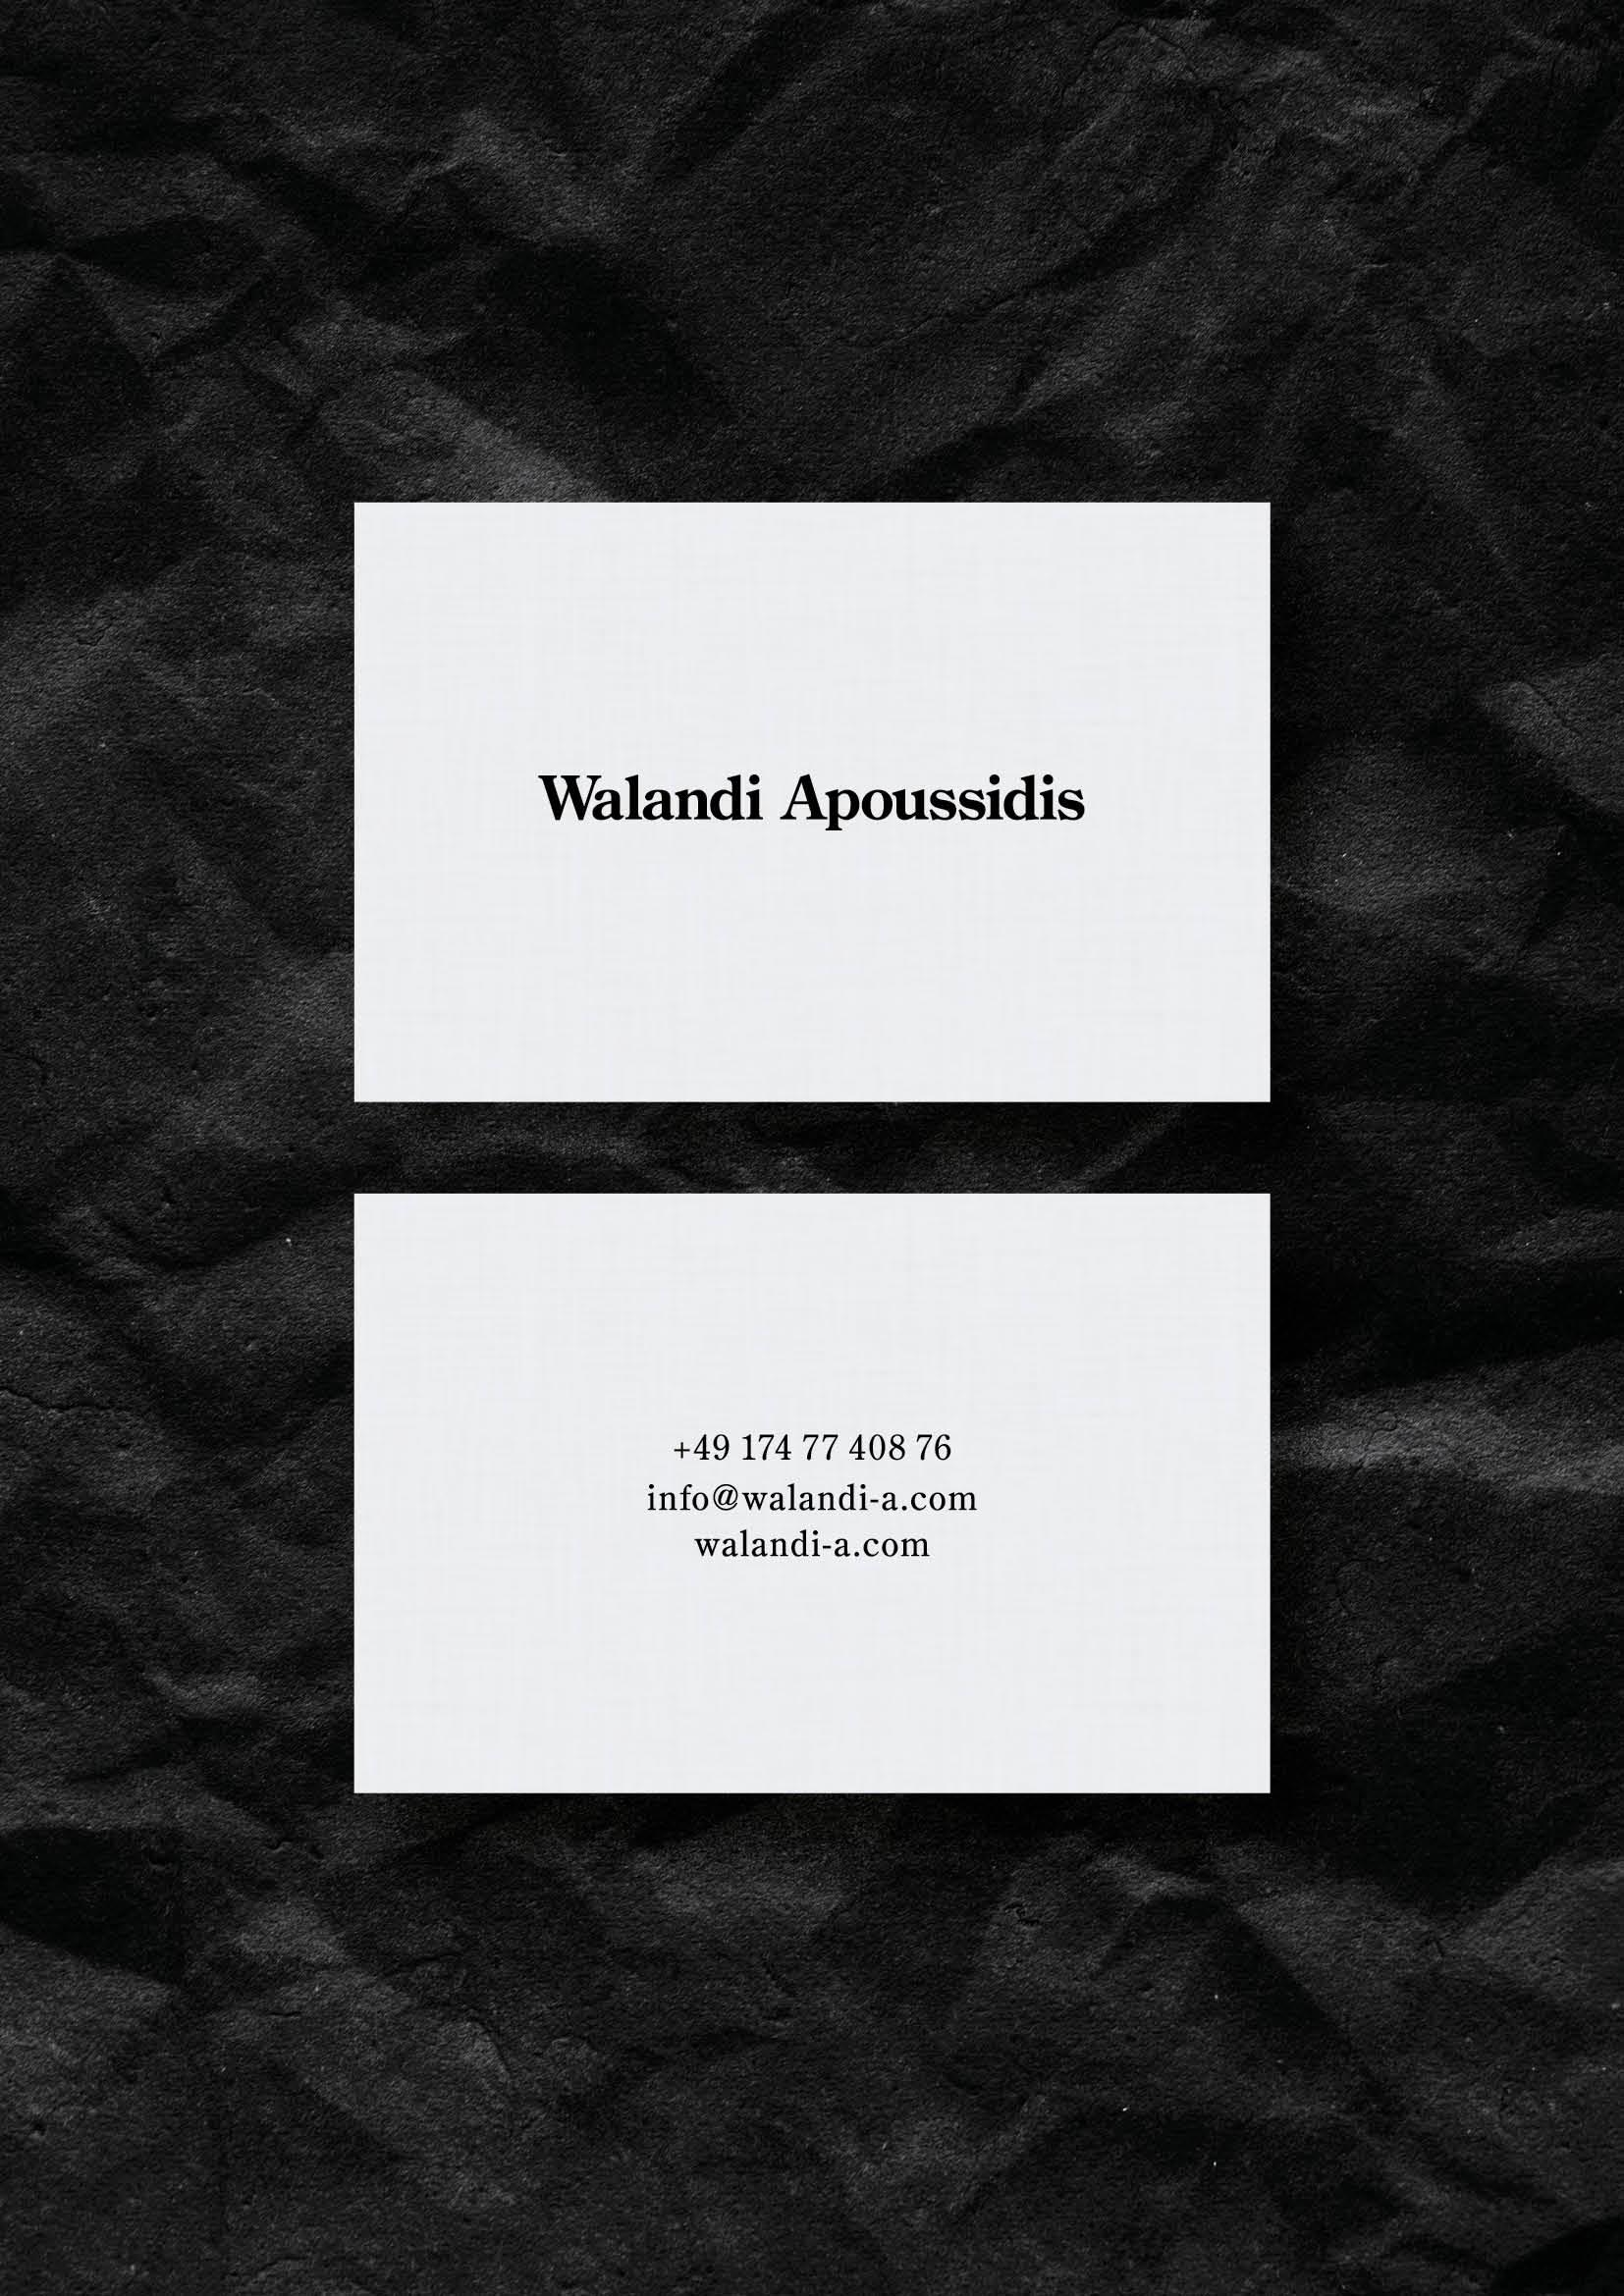 nicoletta-dalfino-walandi-apoussidis-business-card